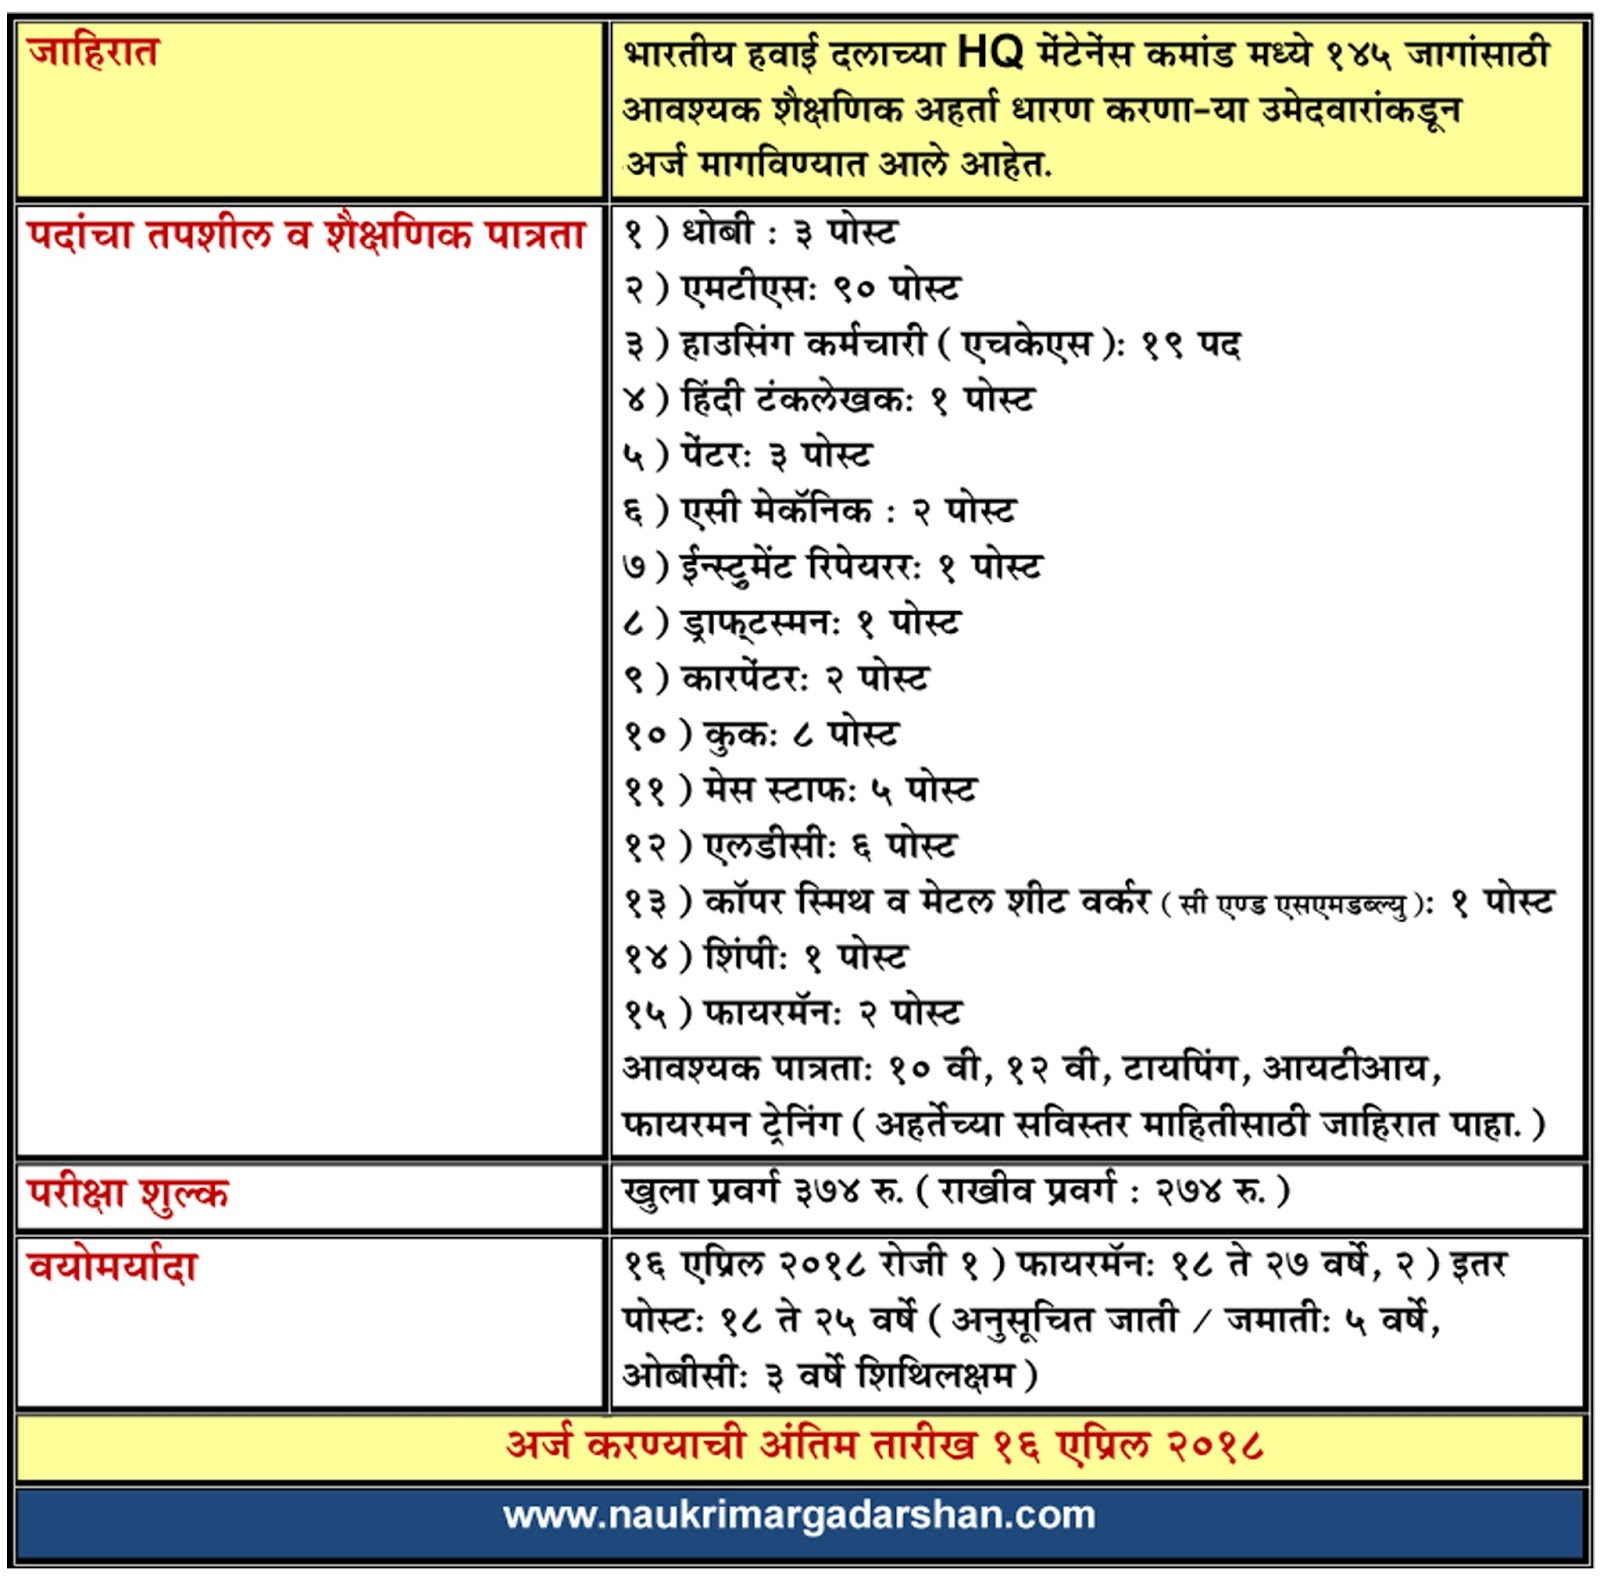 marathi job vacancy, naukri margadarshan, nokri margdarshan, air force advertisement